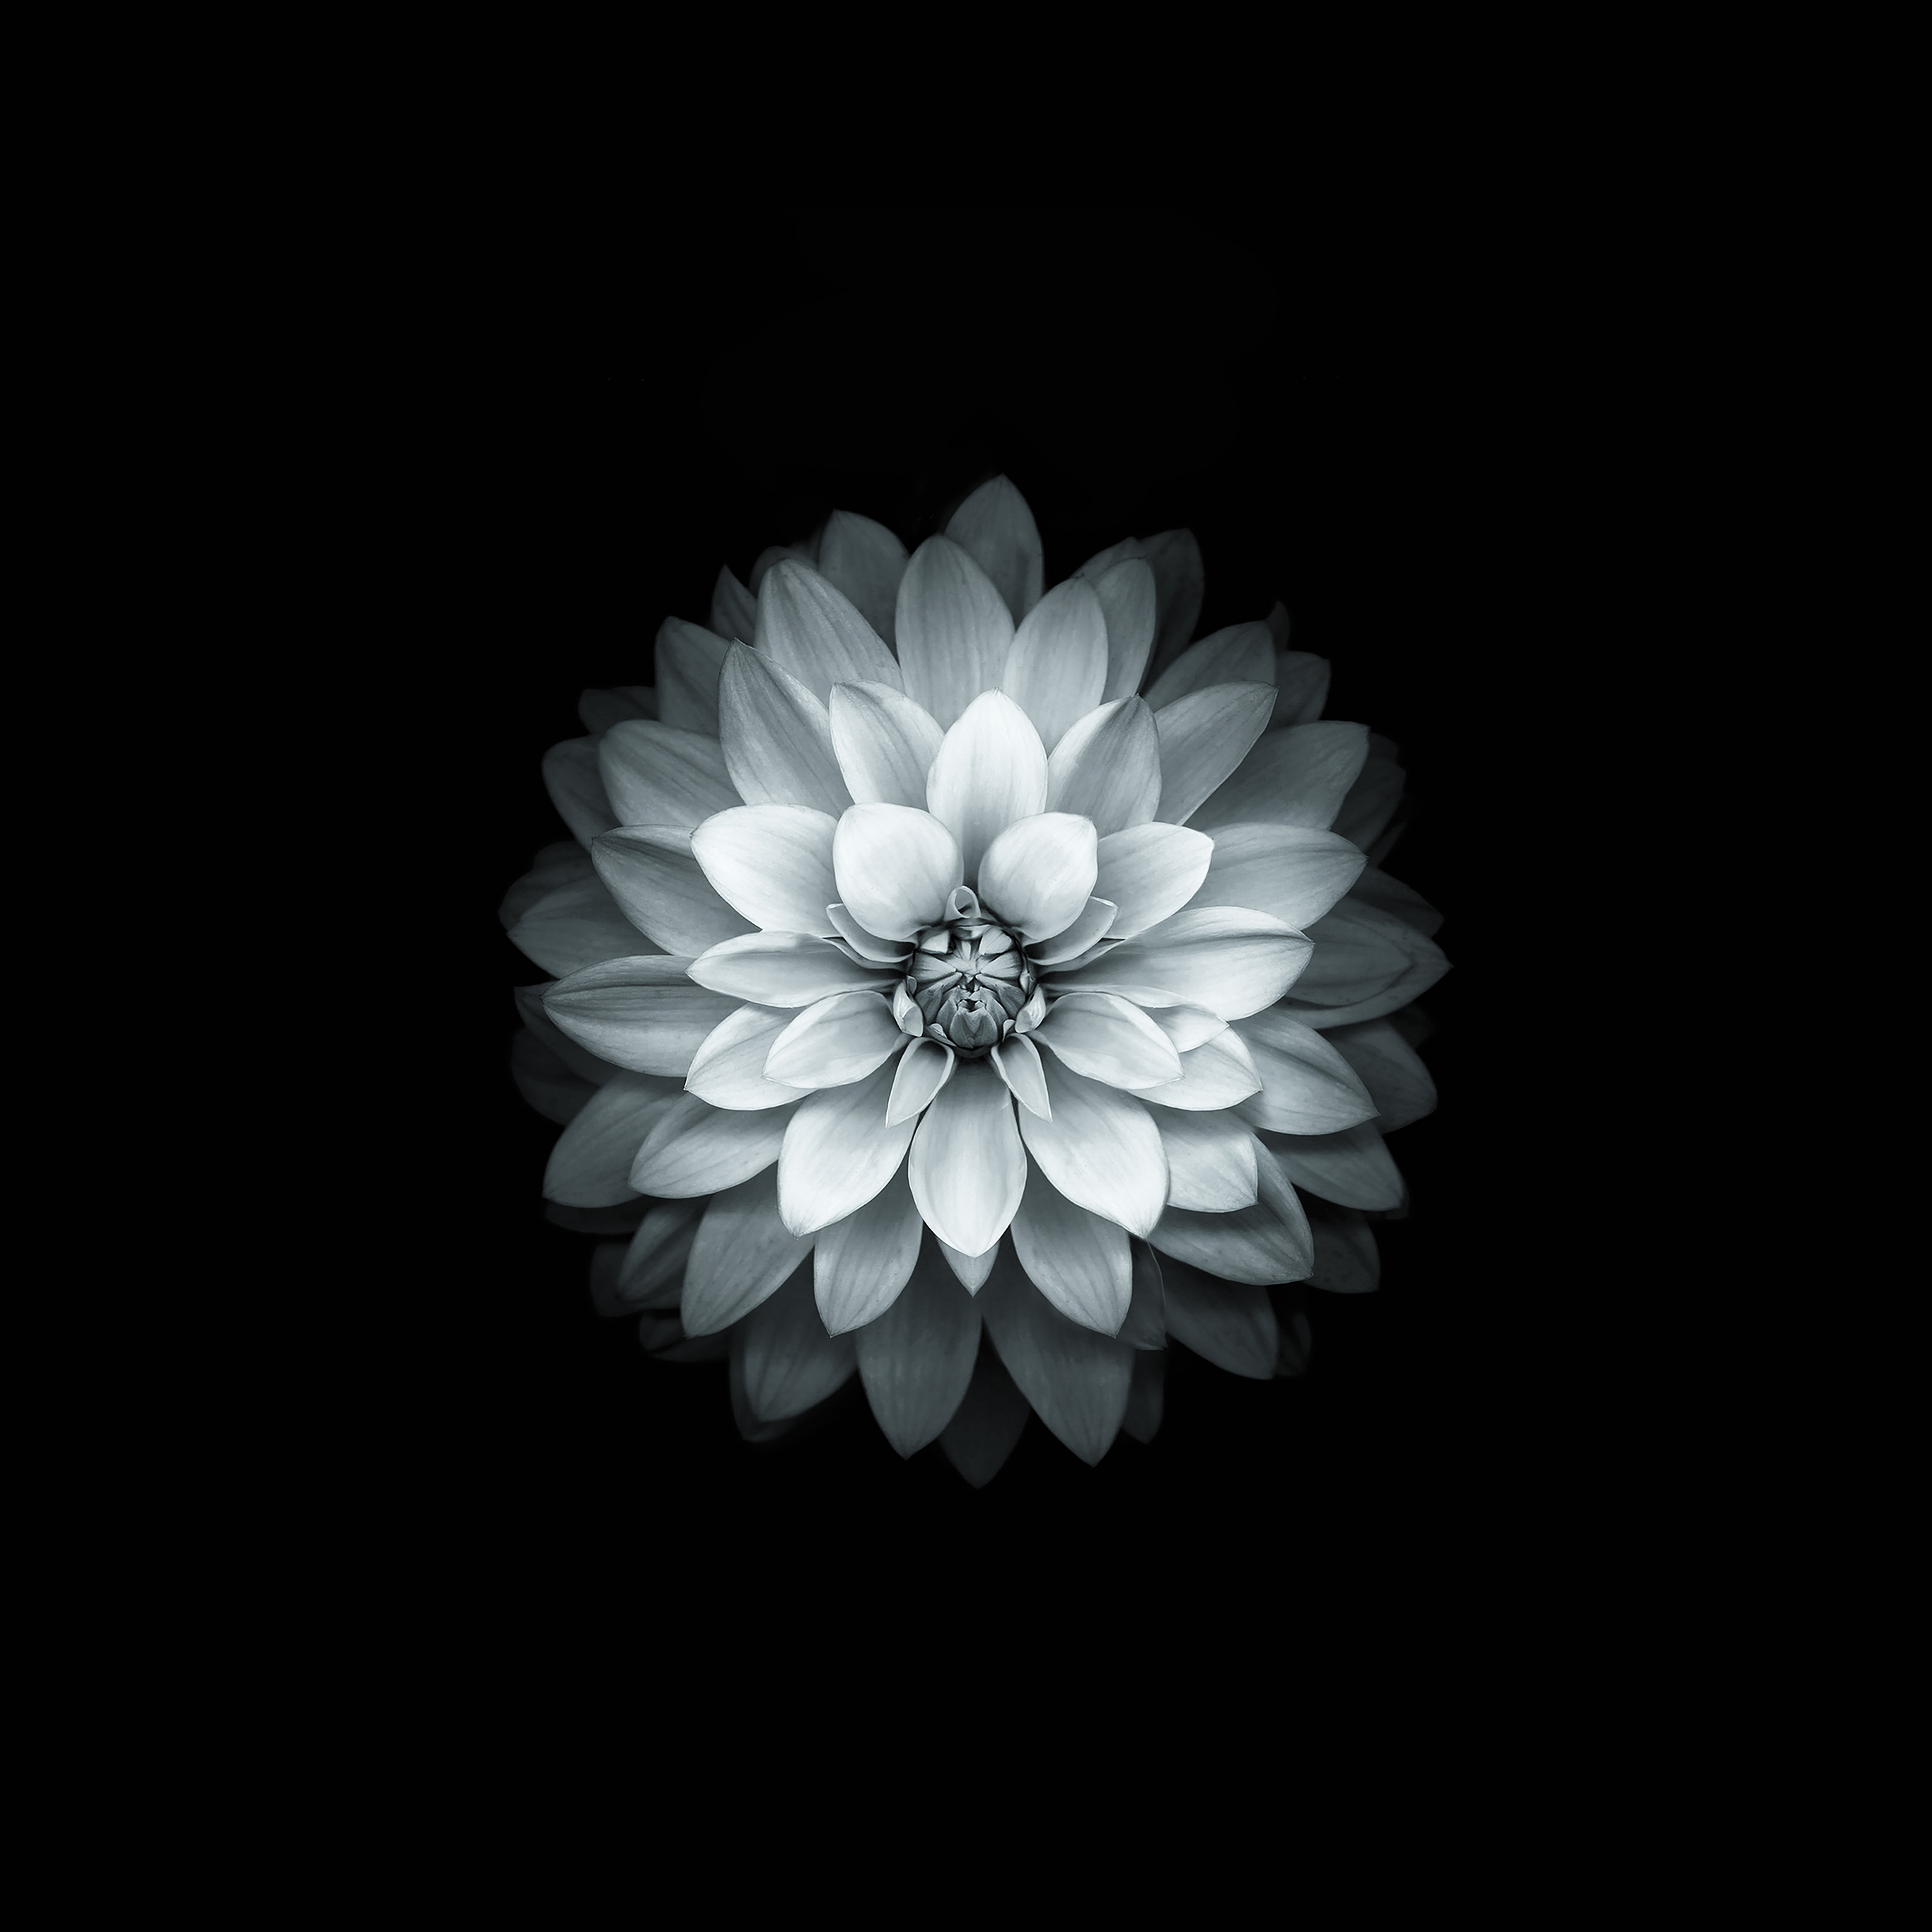 Ad41 apple white lotus iphone6 plus ios8 flower wallpaper ipad pro mightylinksfo